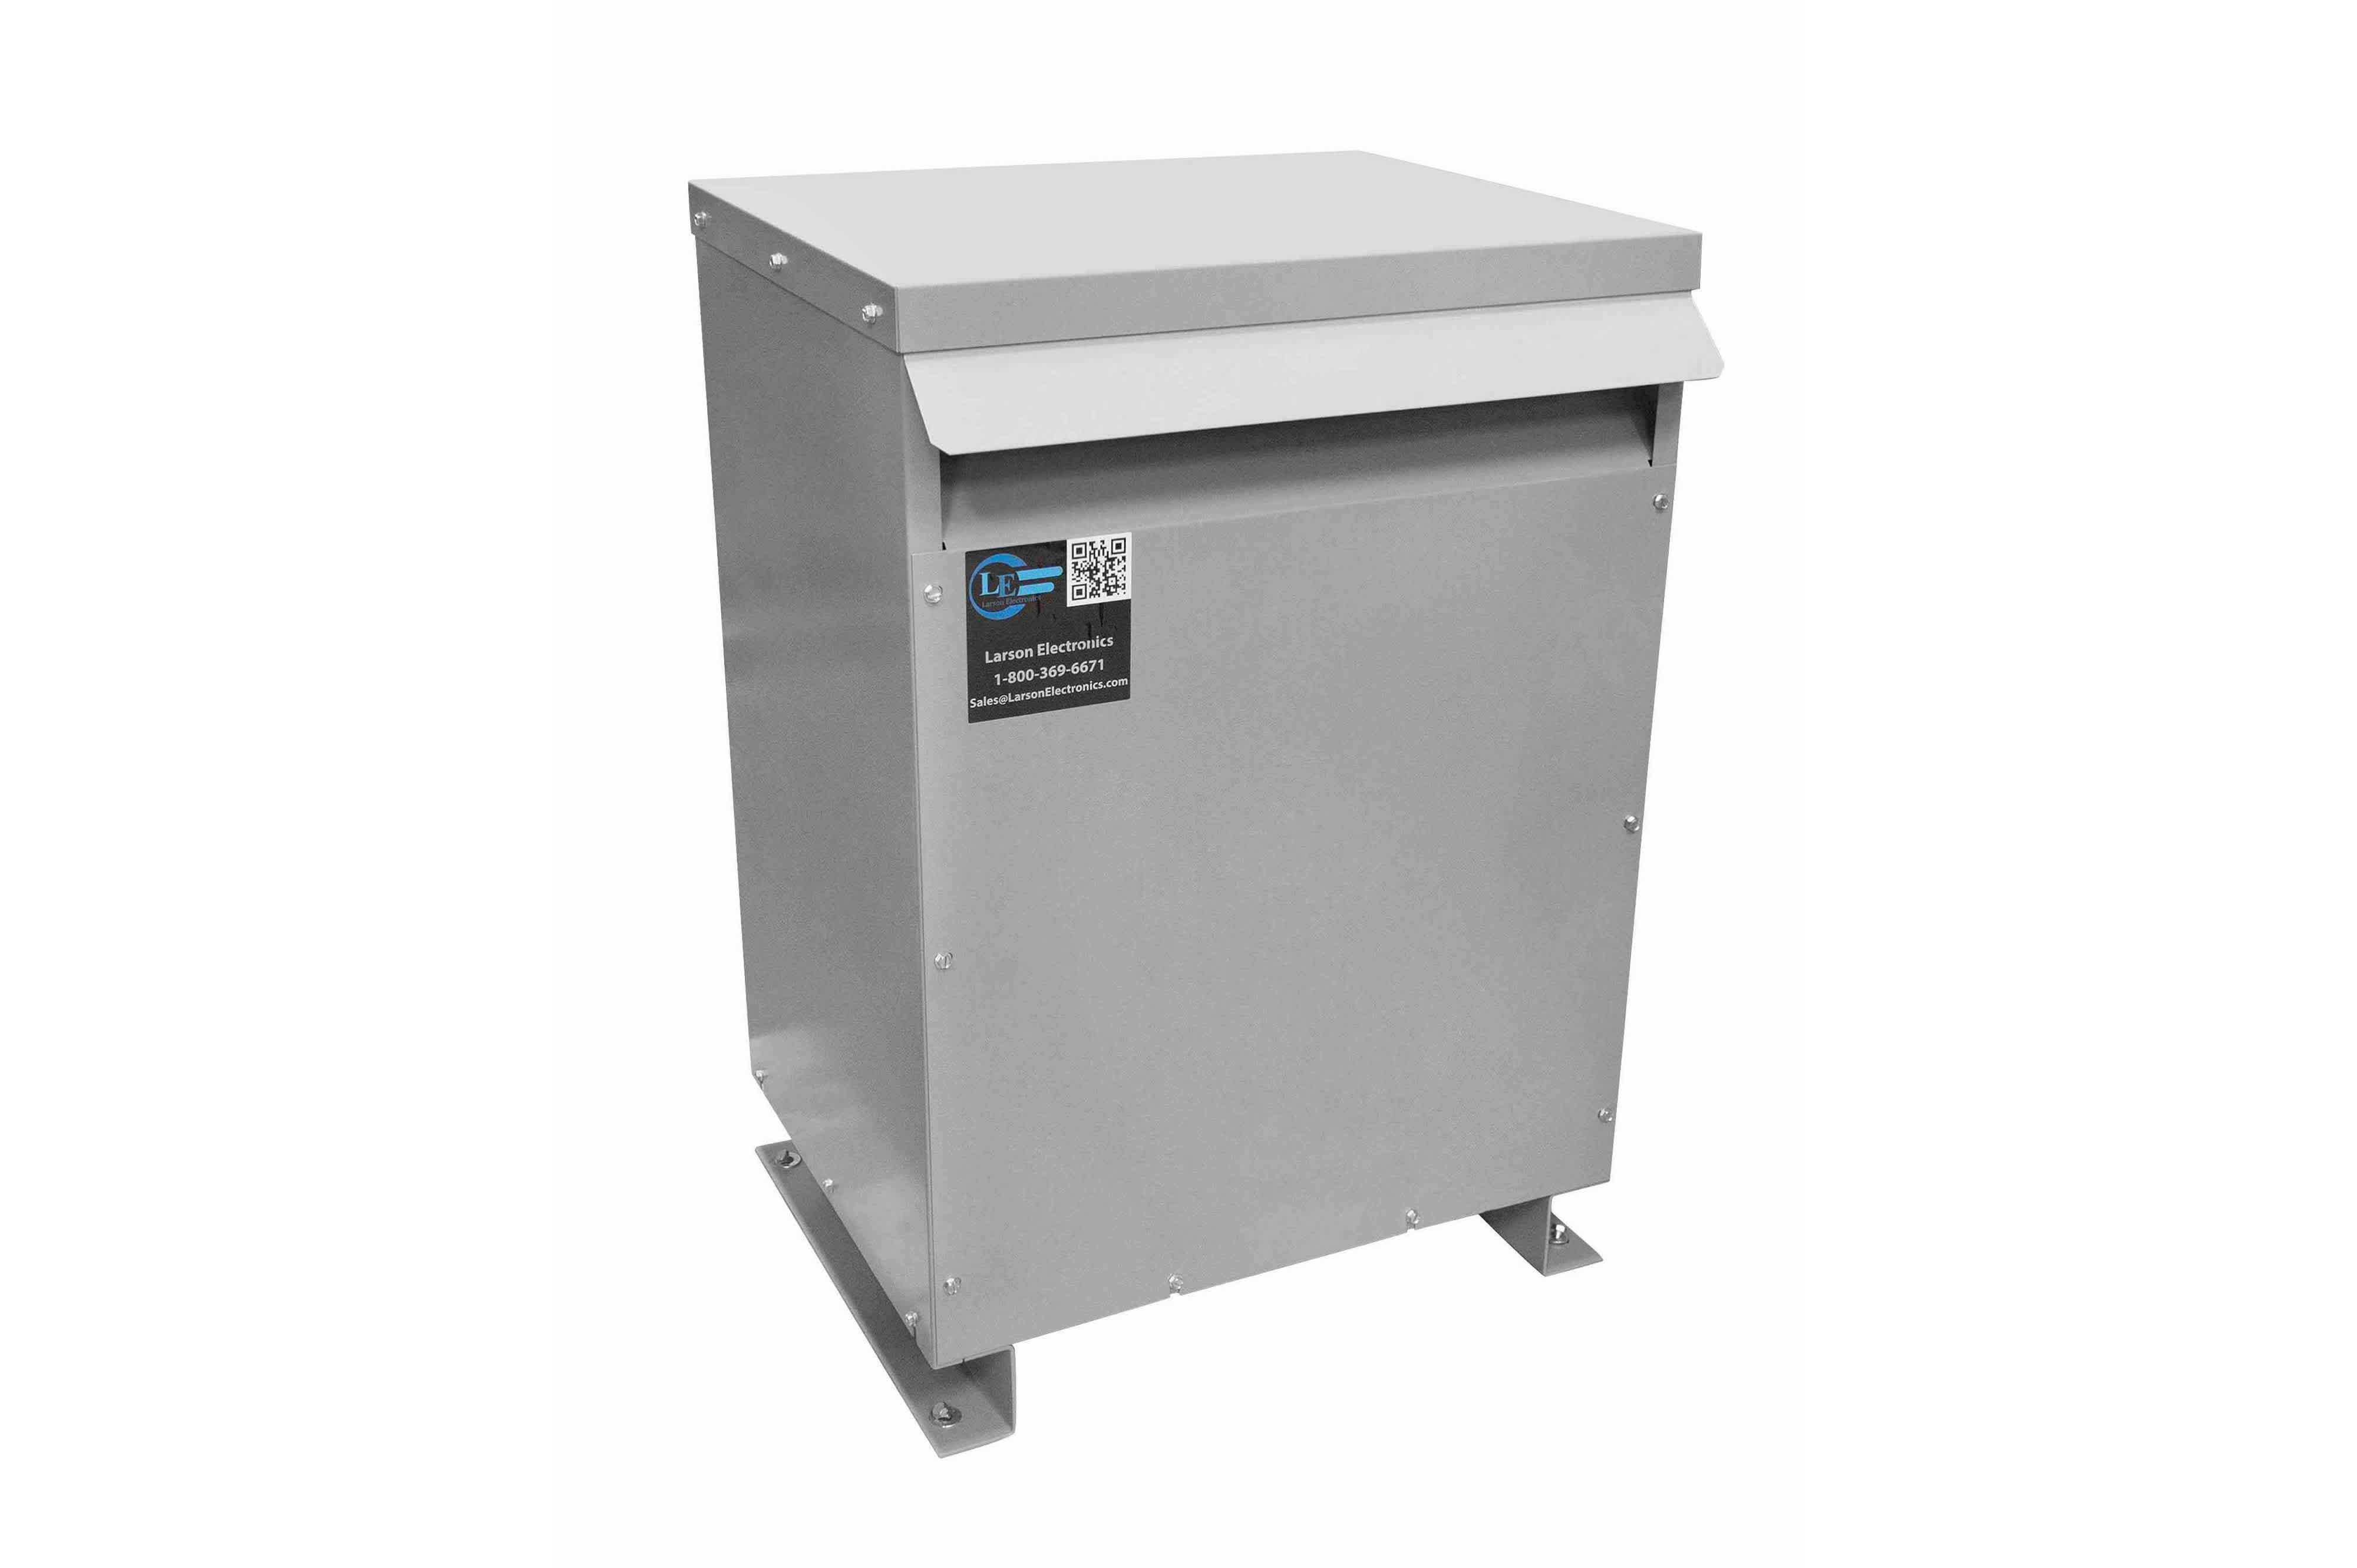 65 kVA 3PH Isolation Transformer, 415V Wye Primary, 480V Delta Secondary, N3R, Ventilated, 60 Hz